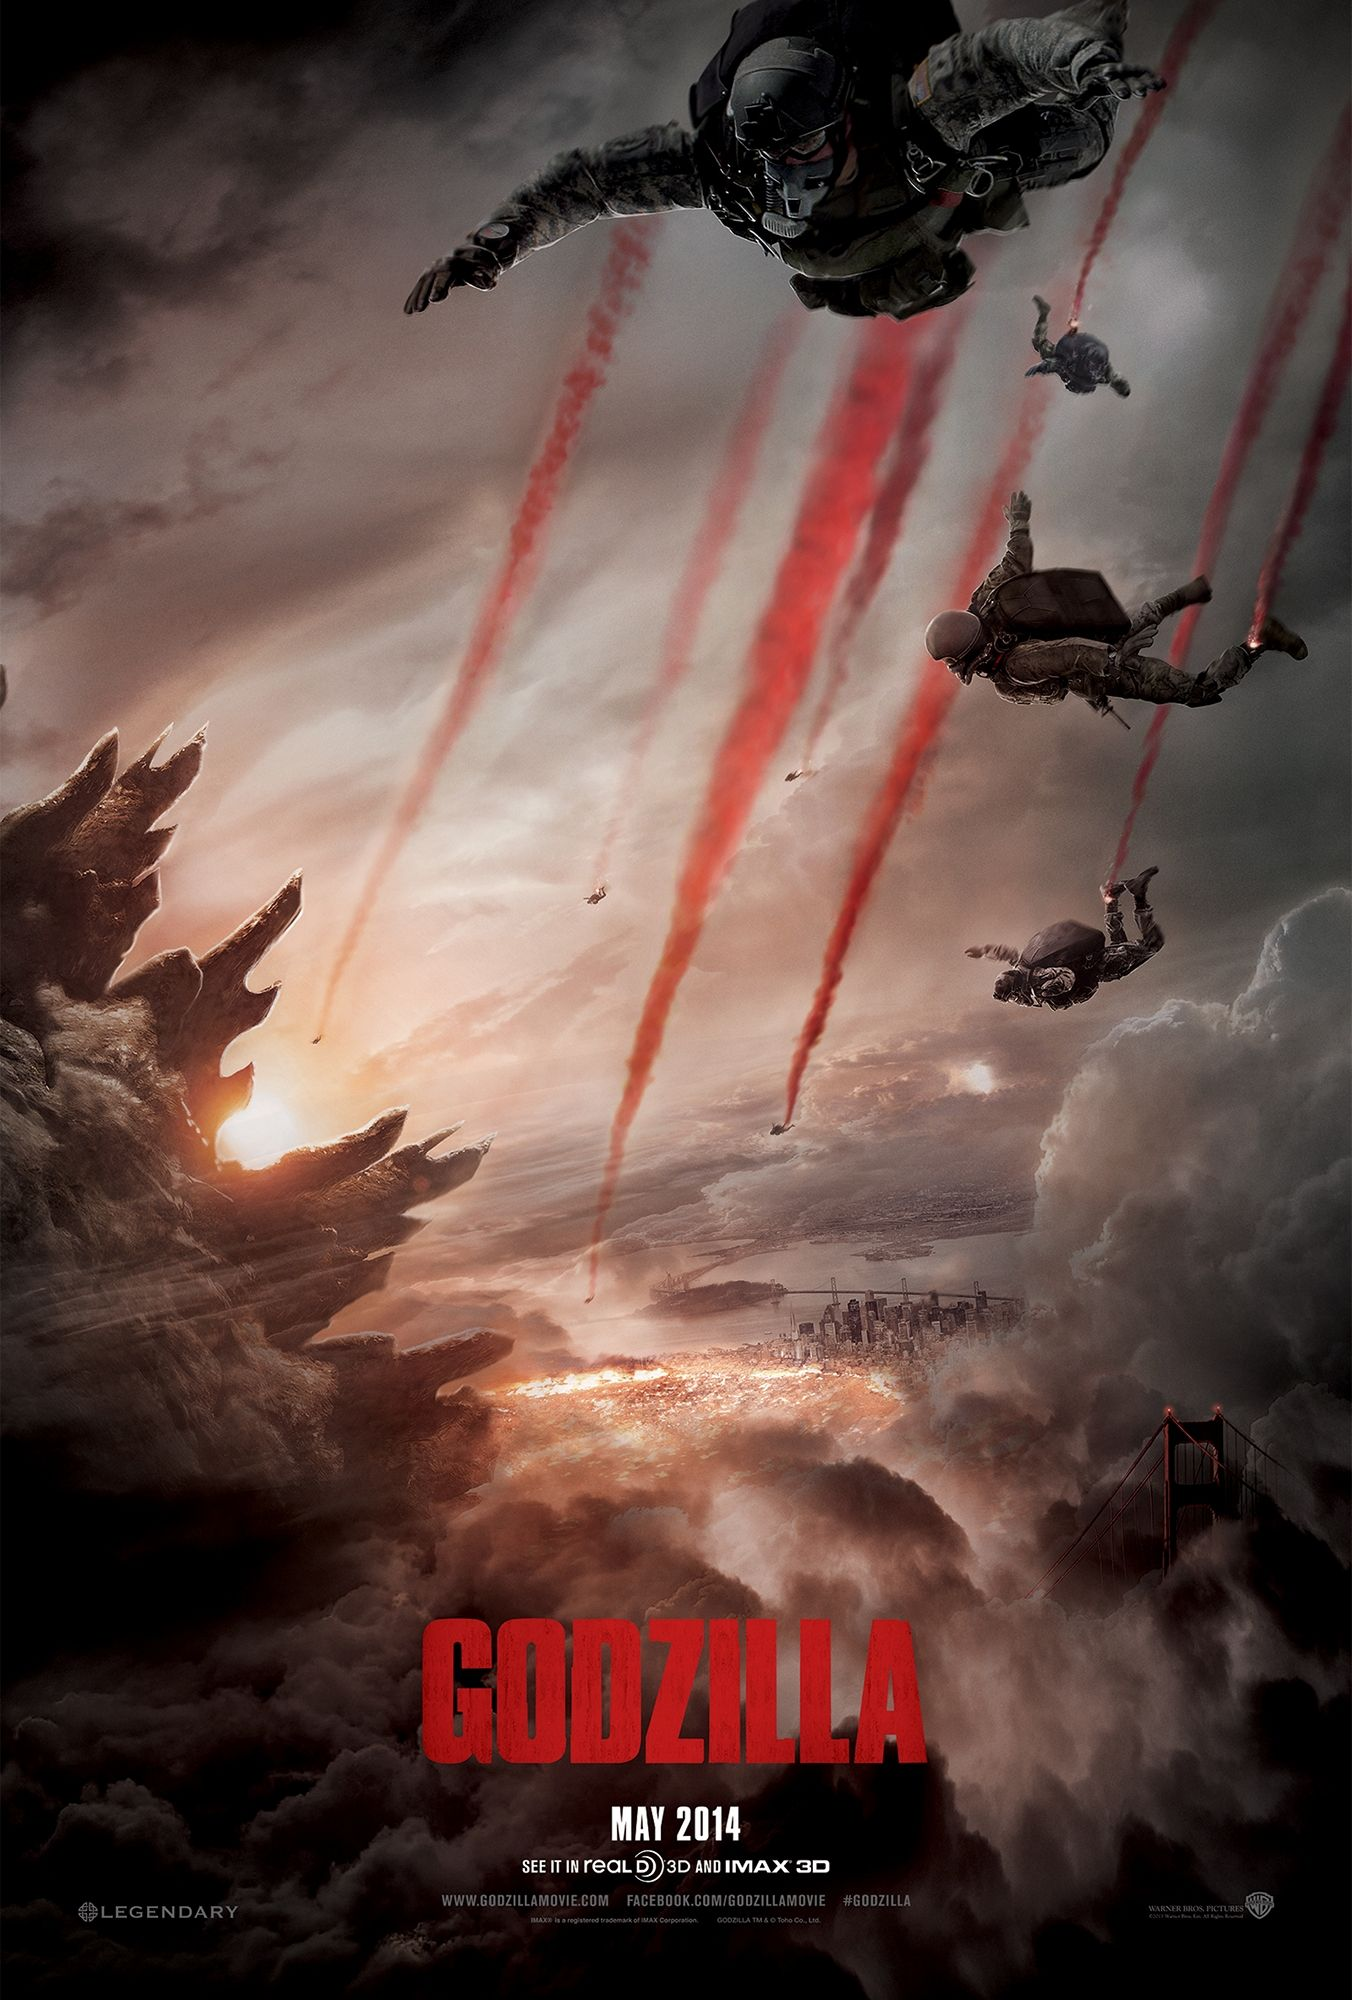 Godzilla 2014 theatrical teaser poster